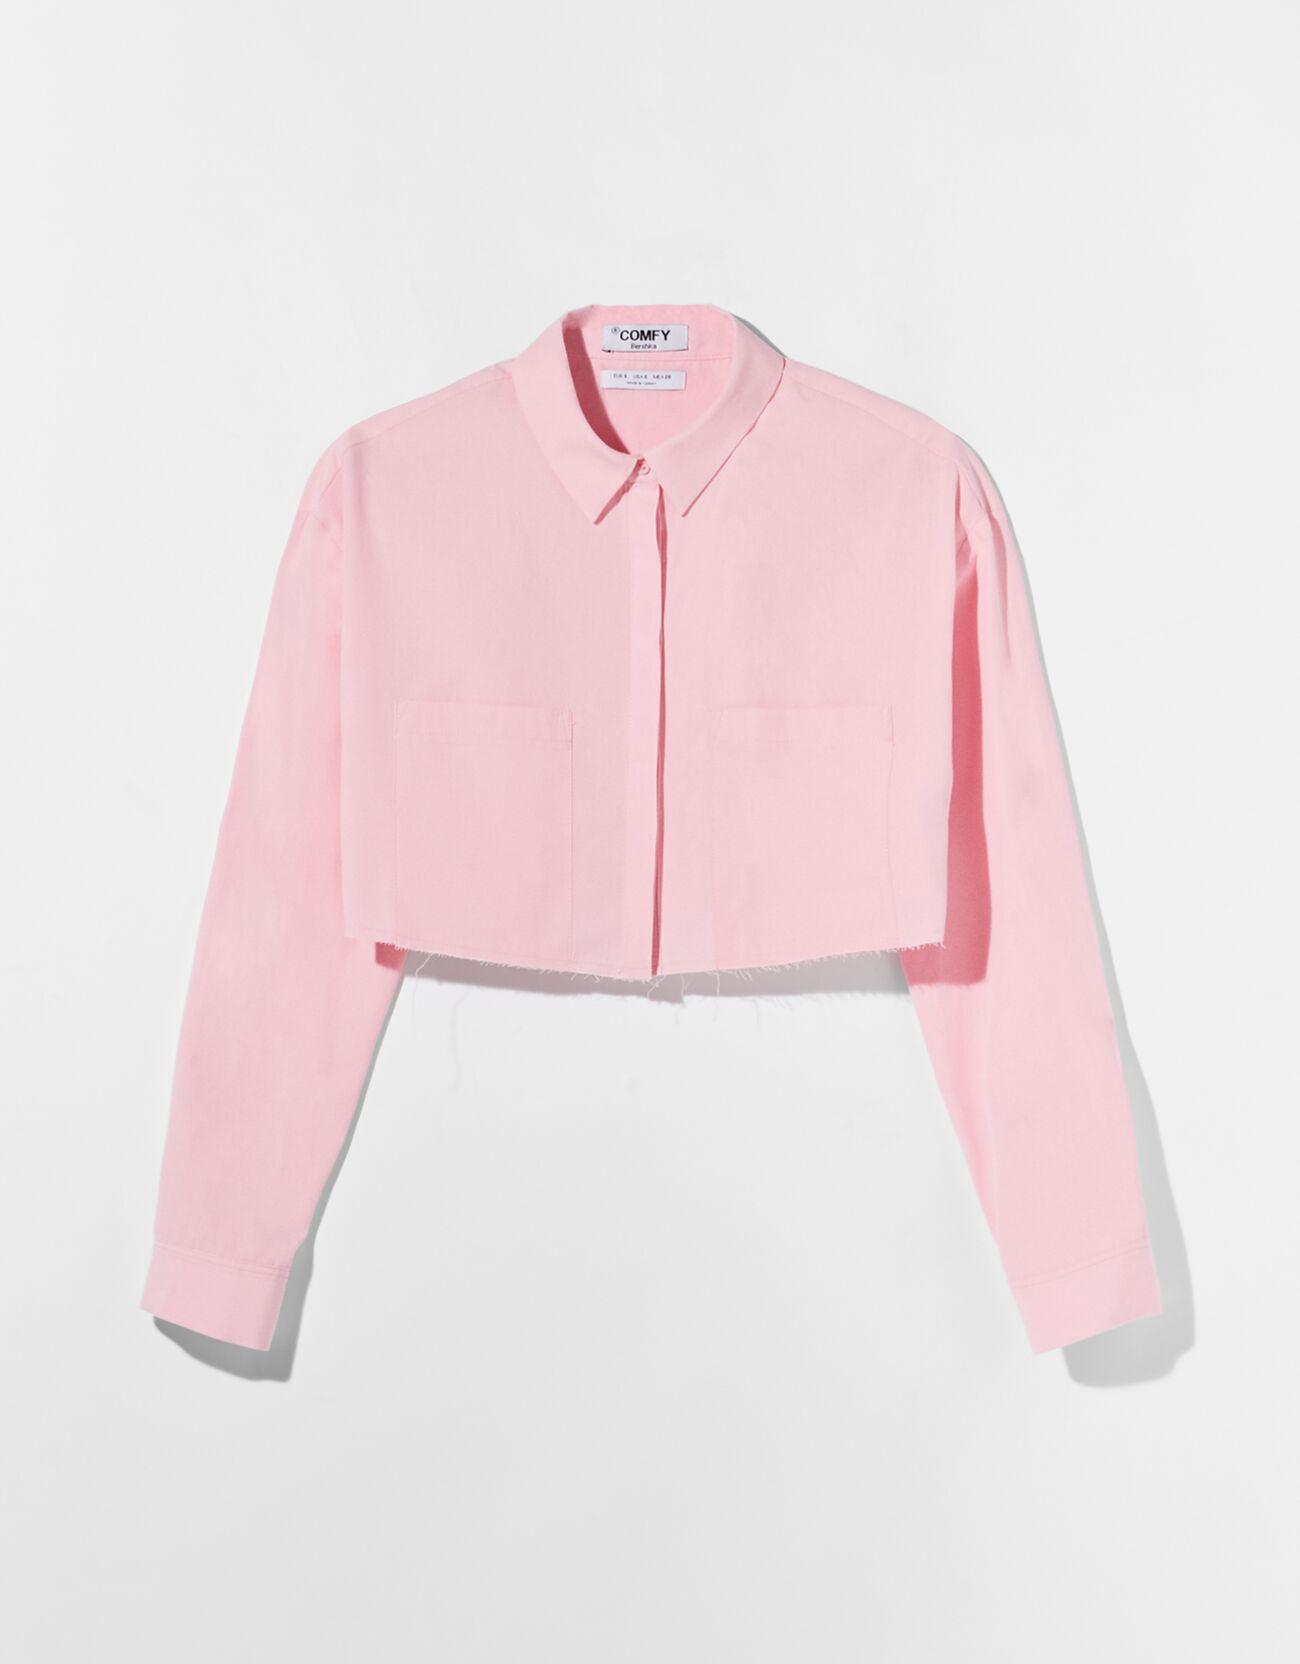 Camisa cropped rosa.